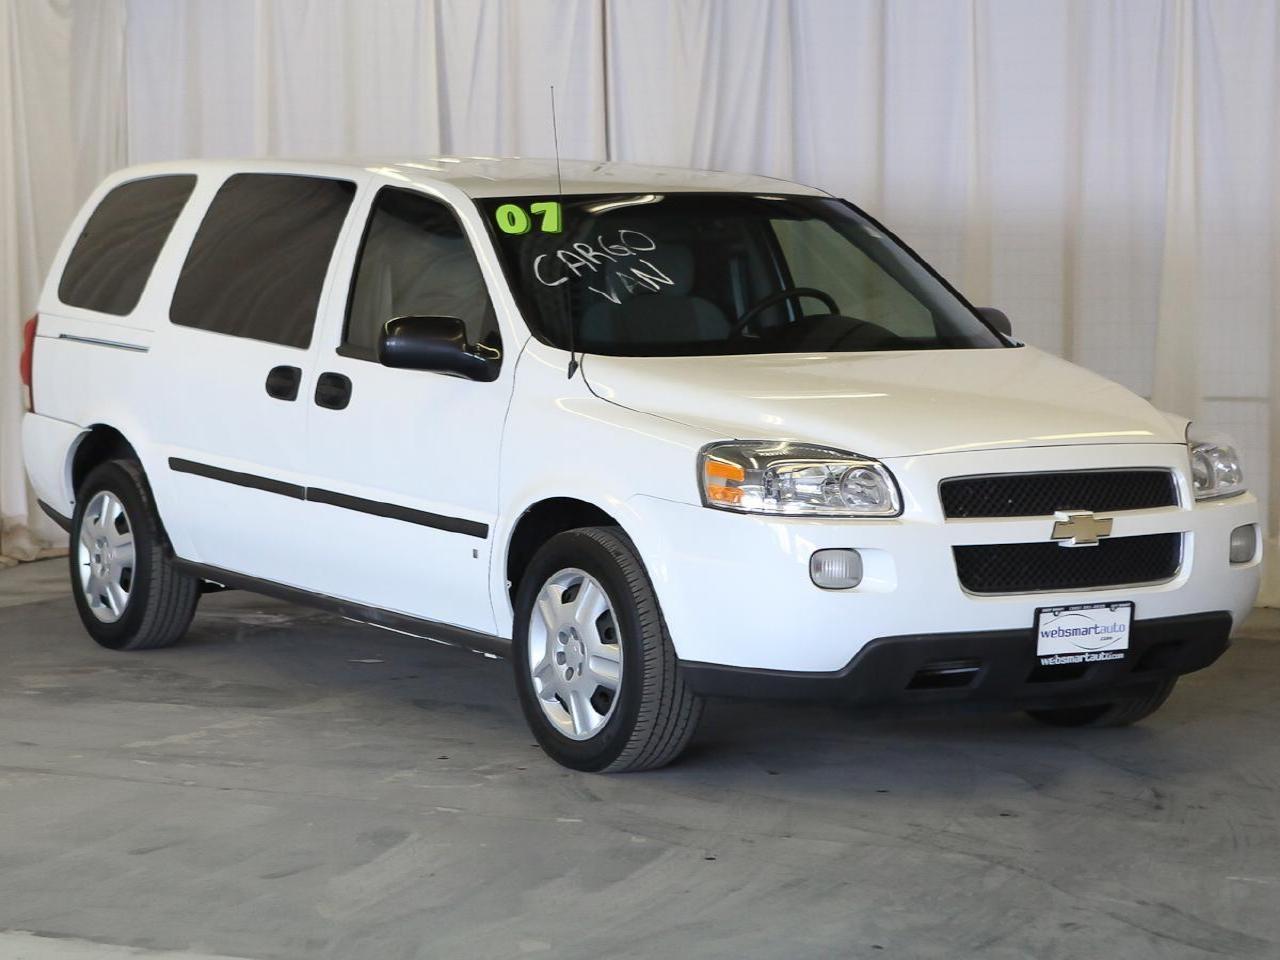 Chevrolet Uplander 2012 foto - 2